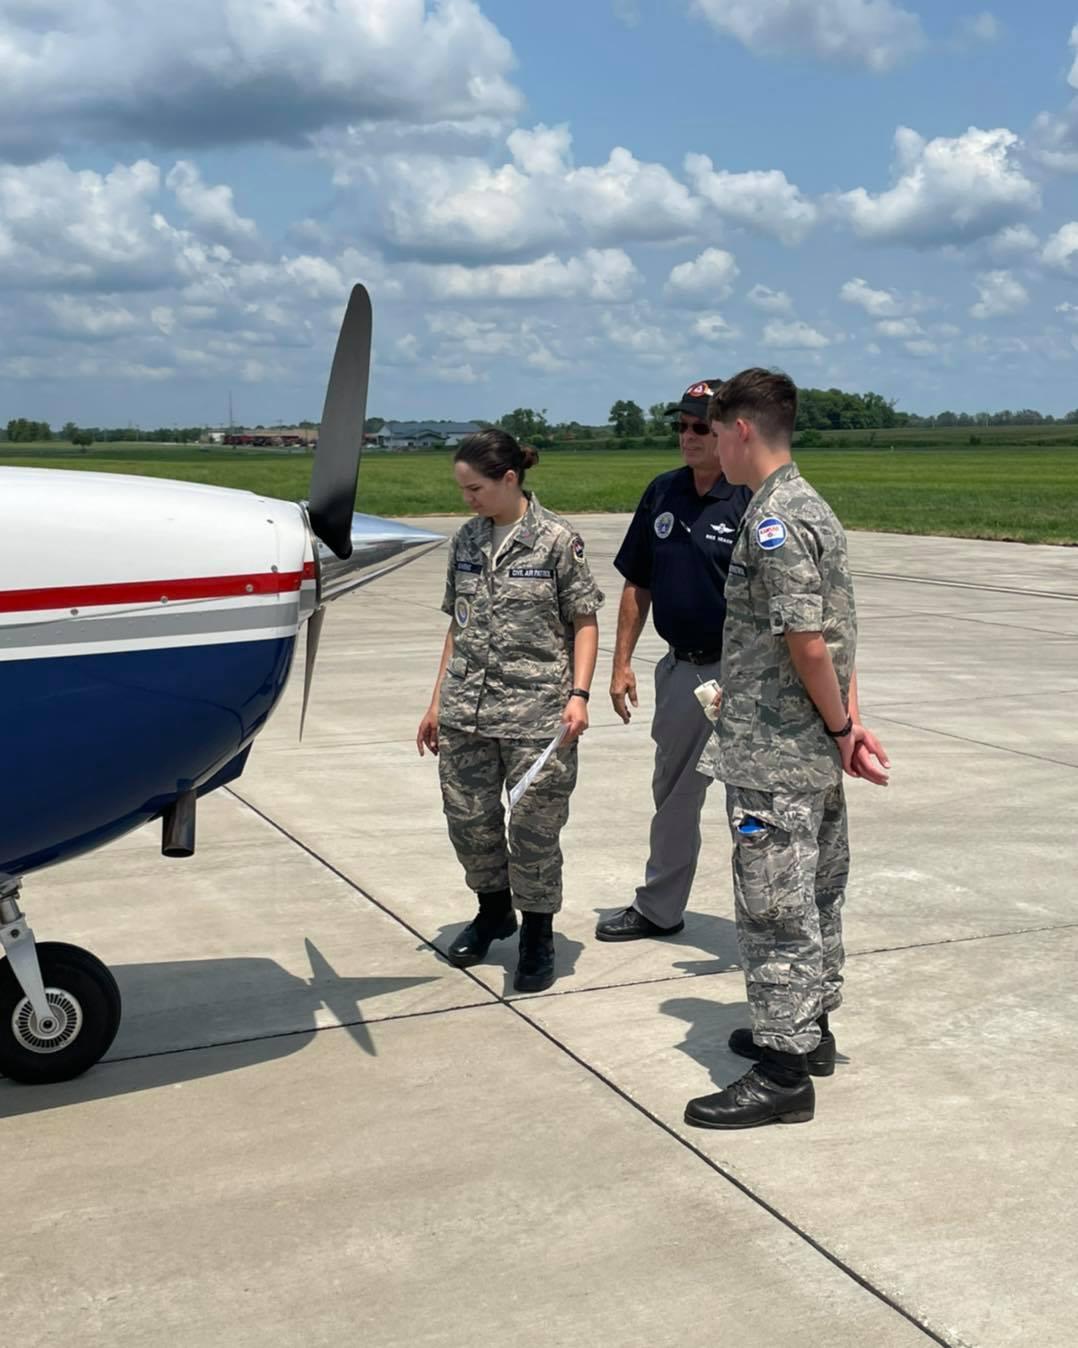 Civil Air Patrol Cadet Camp At Missouri Military Academy